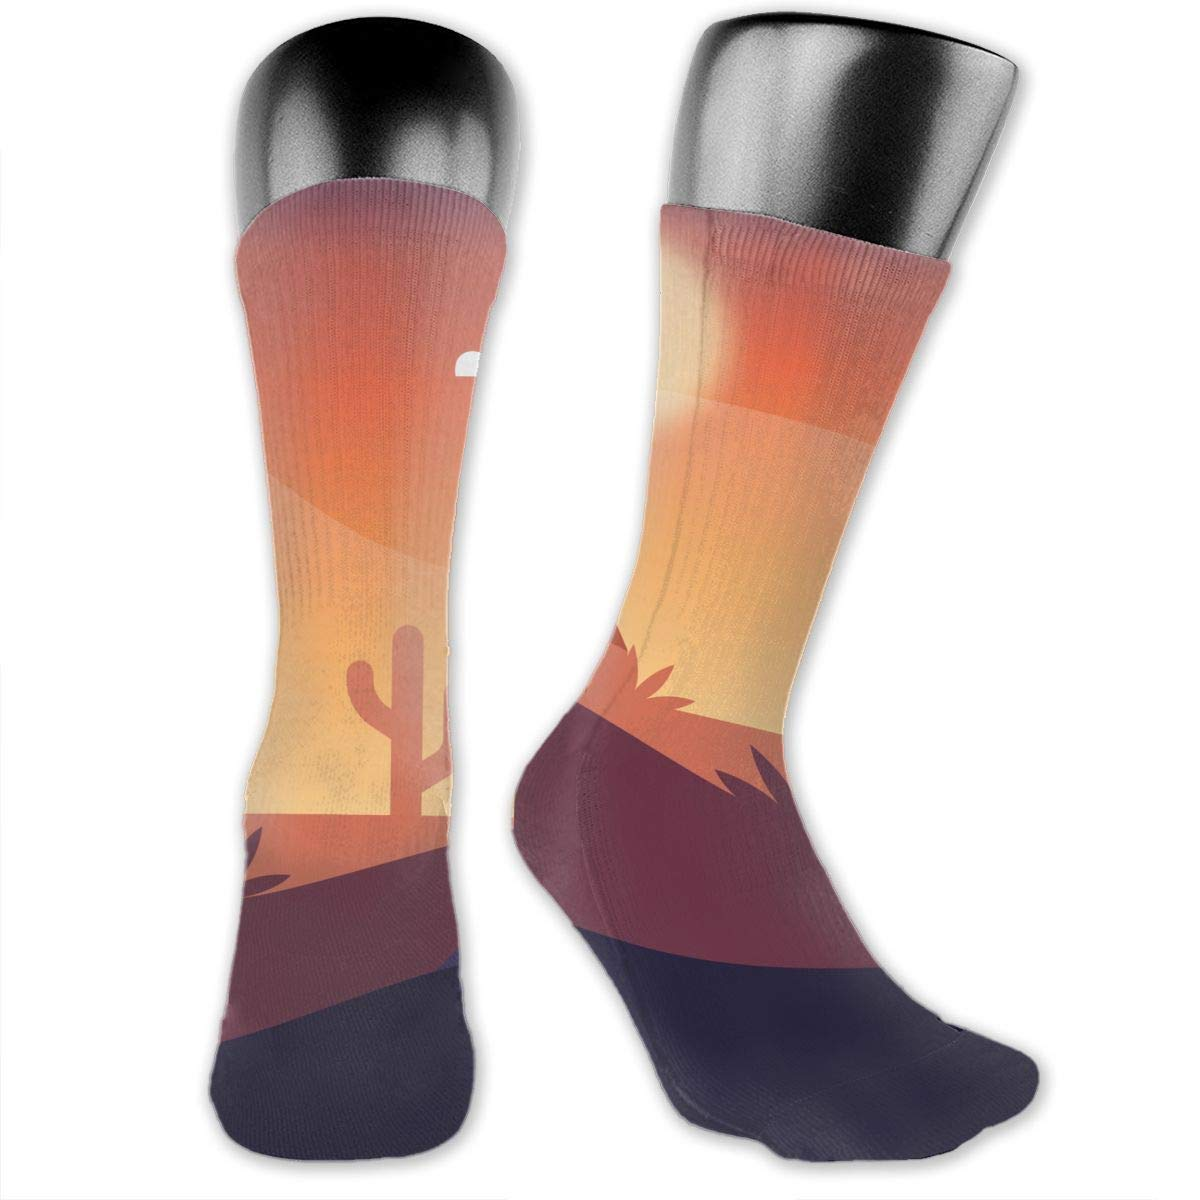 OLGCZM Desert Landscape Design Men Womens Thin High Ankle Casual Socks Fit Outdoor Hiking Trail